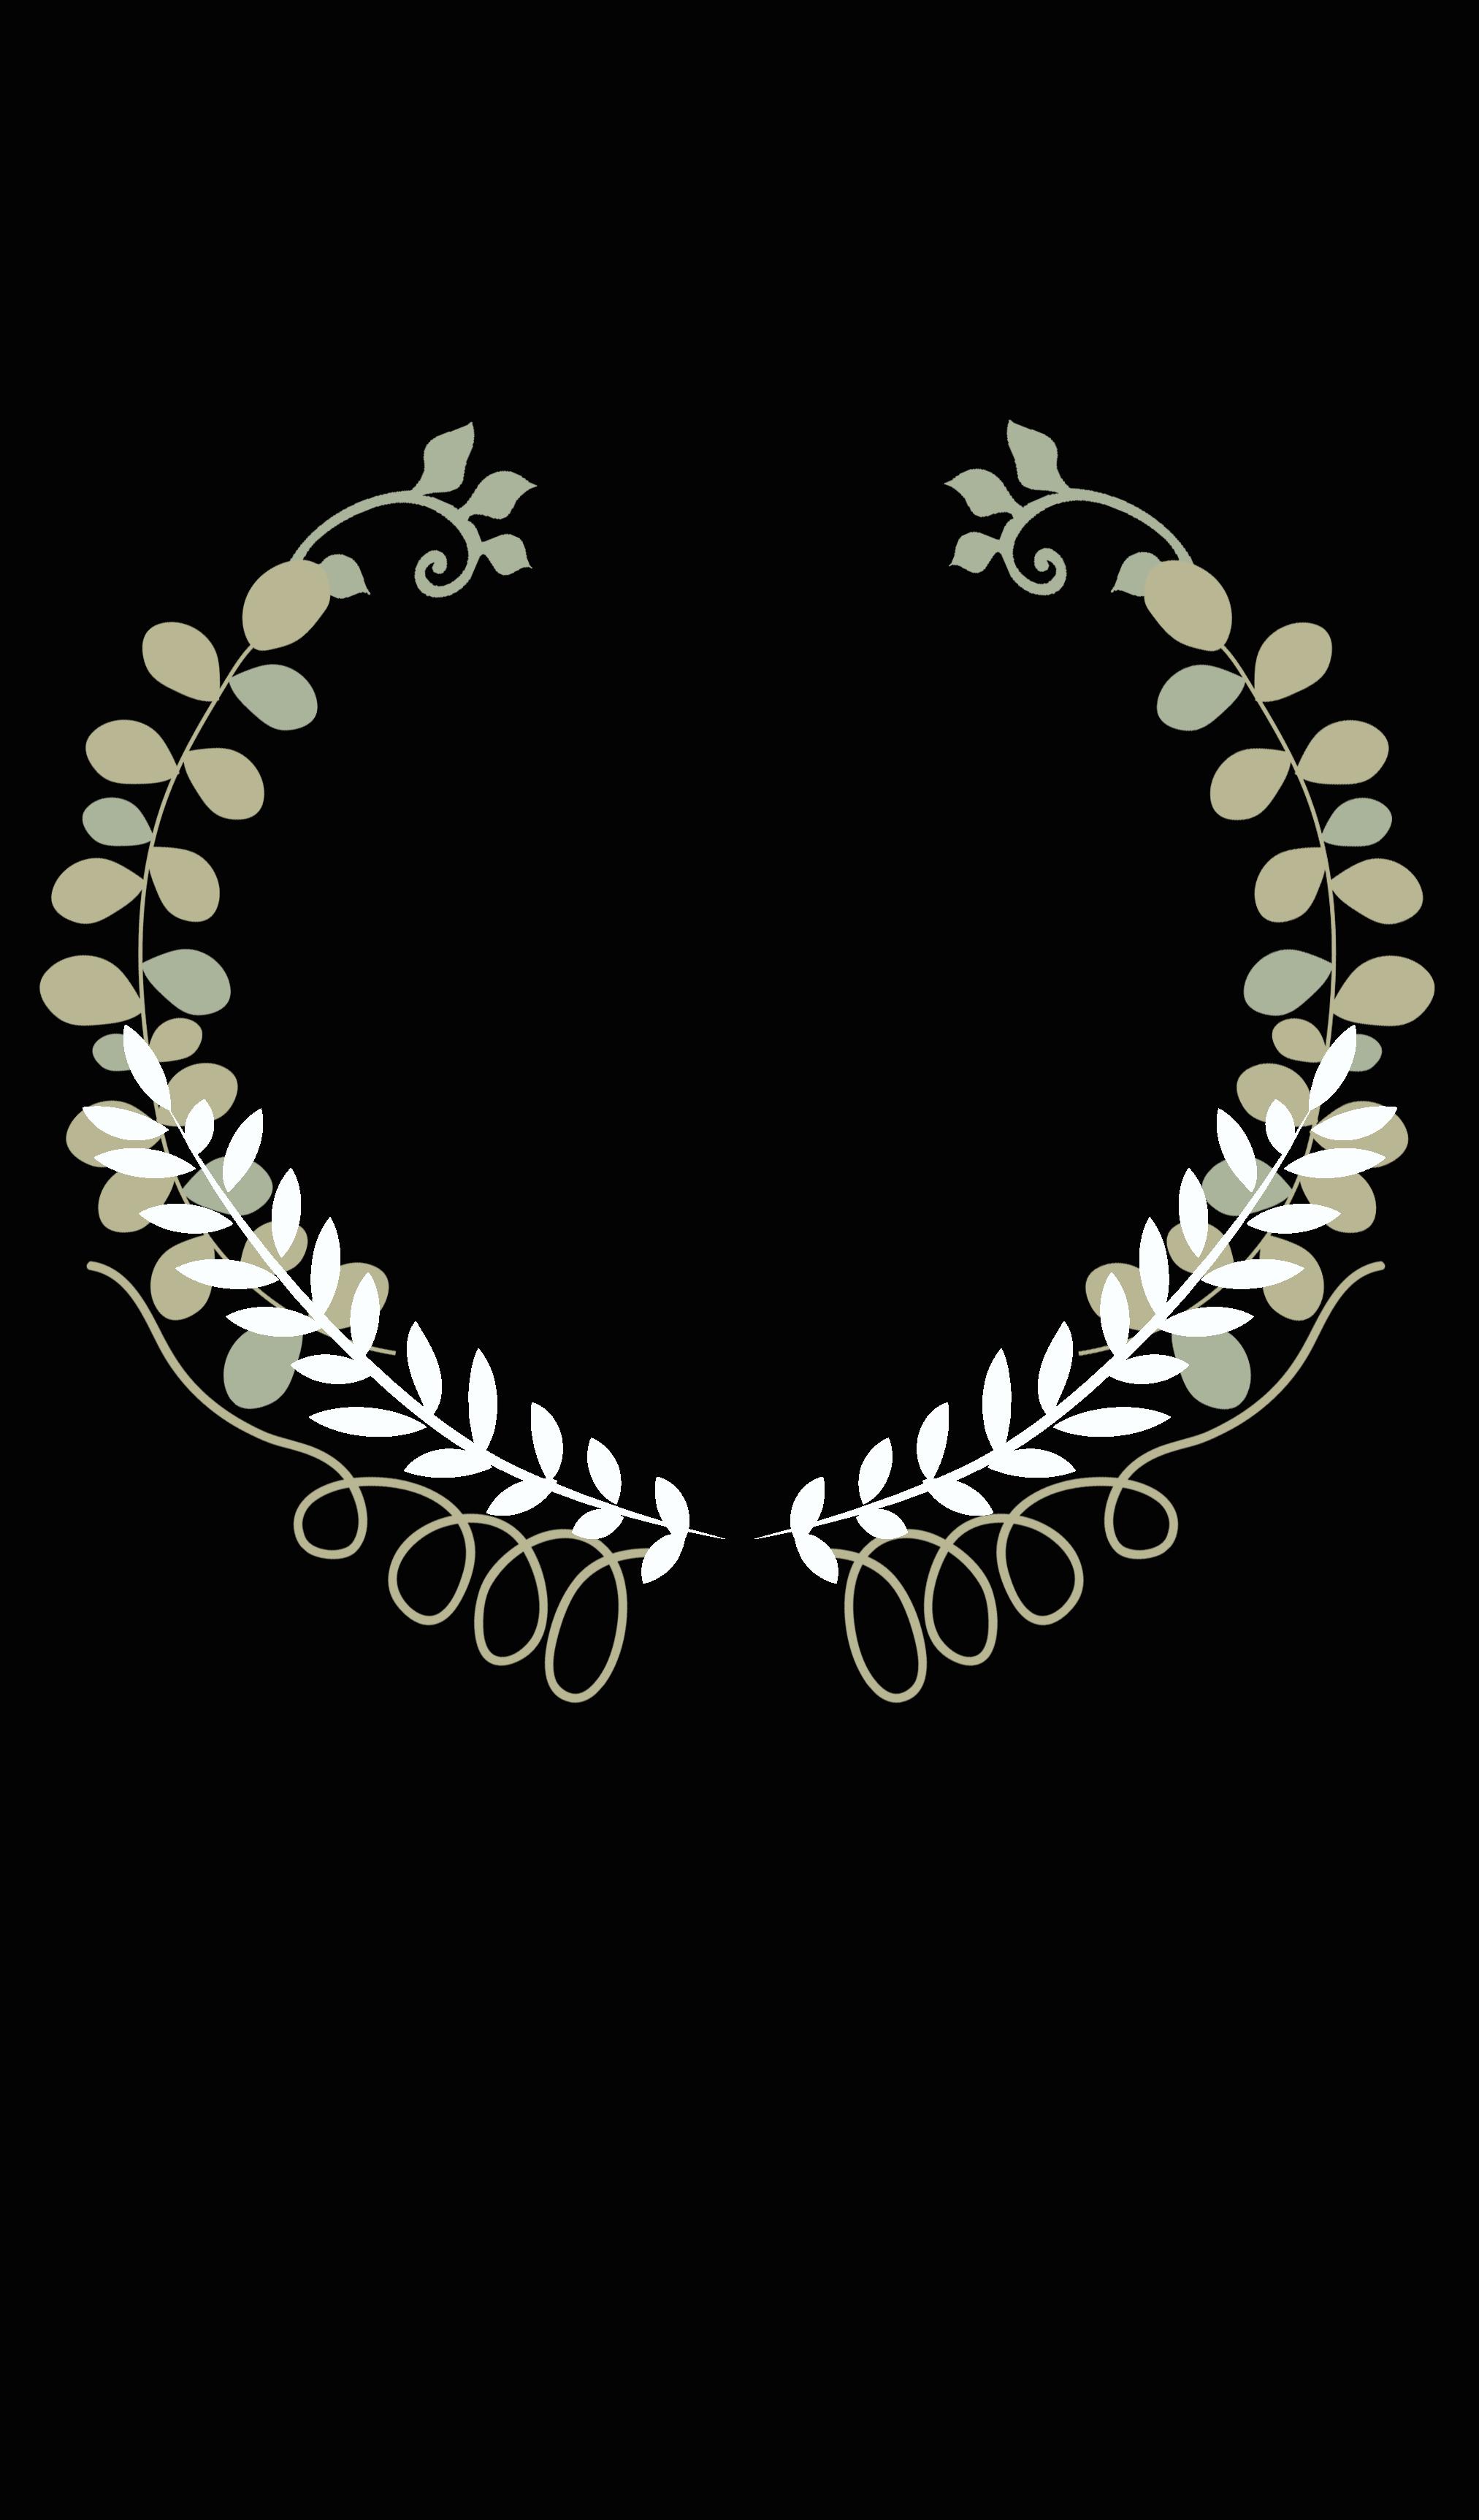 - HONORABLE MENTION - BEST ART FILMAsians On Film Festival, Los AngelesOFFICIAL NOMINEE - BEST ART FILMWest Chester Film Festival 2015, PAOFFICIAL SELECTIONNYC Indie Film Festival 2014Eugene Intl Film Festival 2015Rainier Indie Film Festival 2014Seattle True Indie Film Festival 2015Seattle South Asian Film Festival 2014Chicago South Asian Film Festival 2015Kahbang Arts Film Festival 2014LA Reel Recovery Film Festival 2014Moondance Intl Film Festival 2014Columbia Gorge Intl Film Festival 2014The Other Venice Film Festival 2014Magikal Charm Expt Film Festival 2015Mouskaka Indie Film Festival 2014Taoz Shortz Film Festival 2015Goa Short Film Festival 2015Big Mini Media Film Festival 2014Glovebox Short Film Festival 2014Gig Harbor Indie Film Festival 2014Renton Best Fest Film Festival 2014Bogata Expt Film Festival 2015